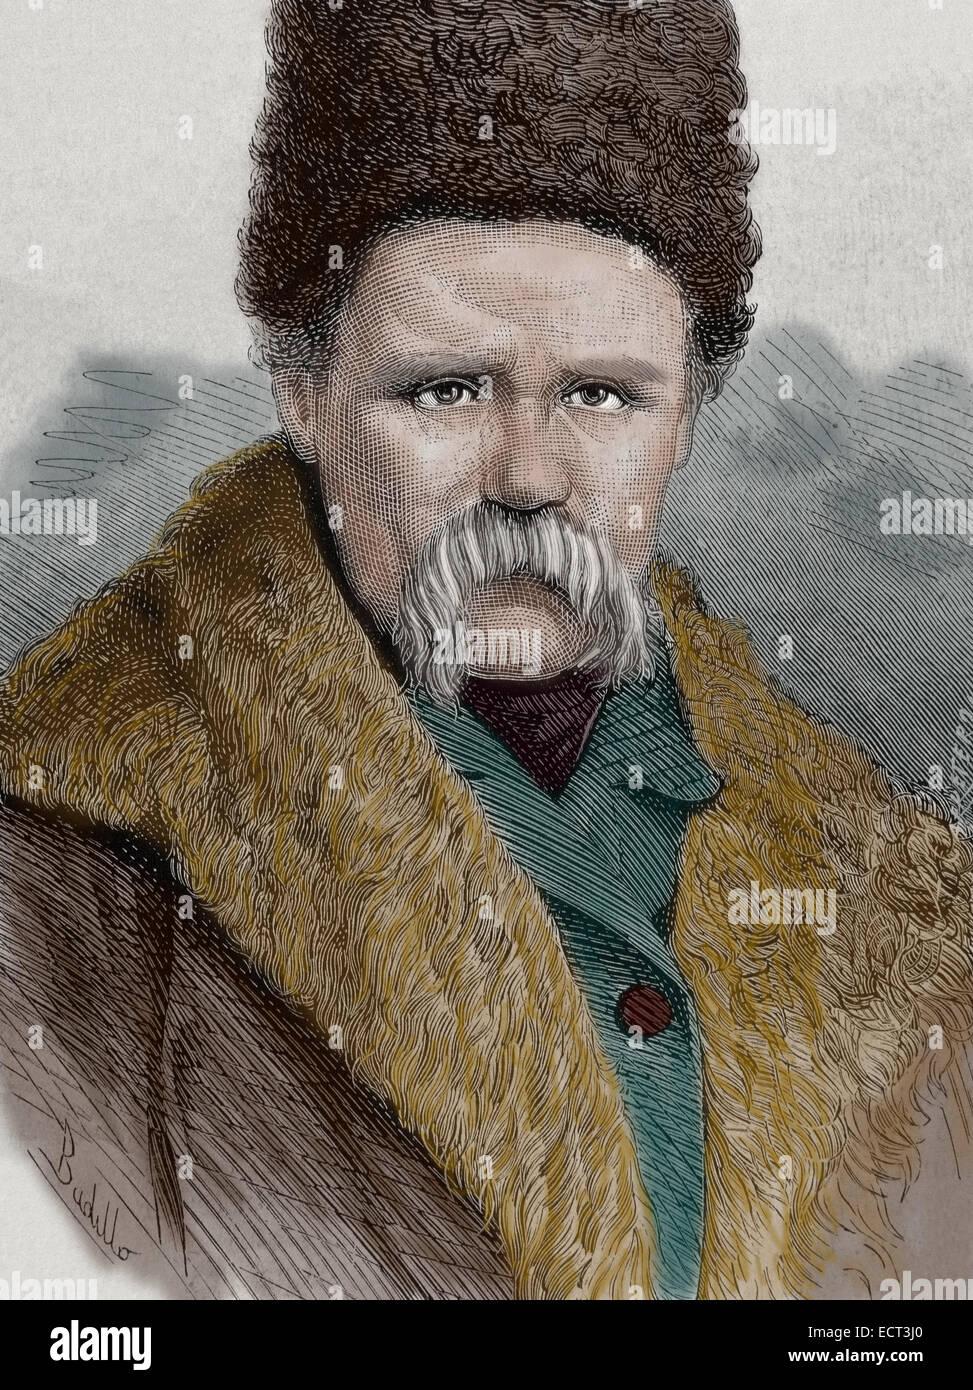 Taras Shevchenko (1814-1861). Ukrainian poet. Engraving by La Ilustracion Espanola y Americana, 1877. Colored. - Stock Image